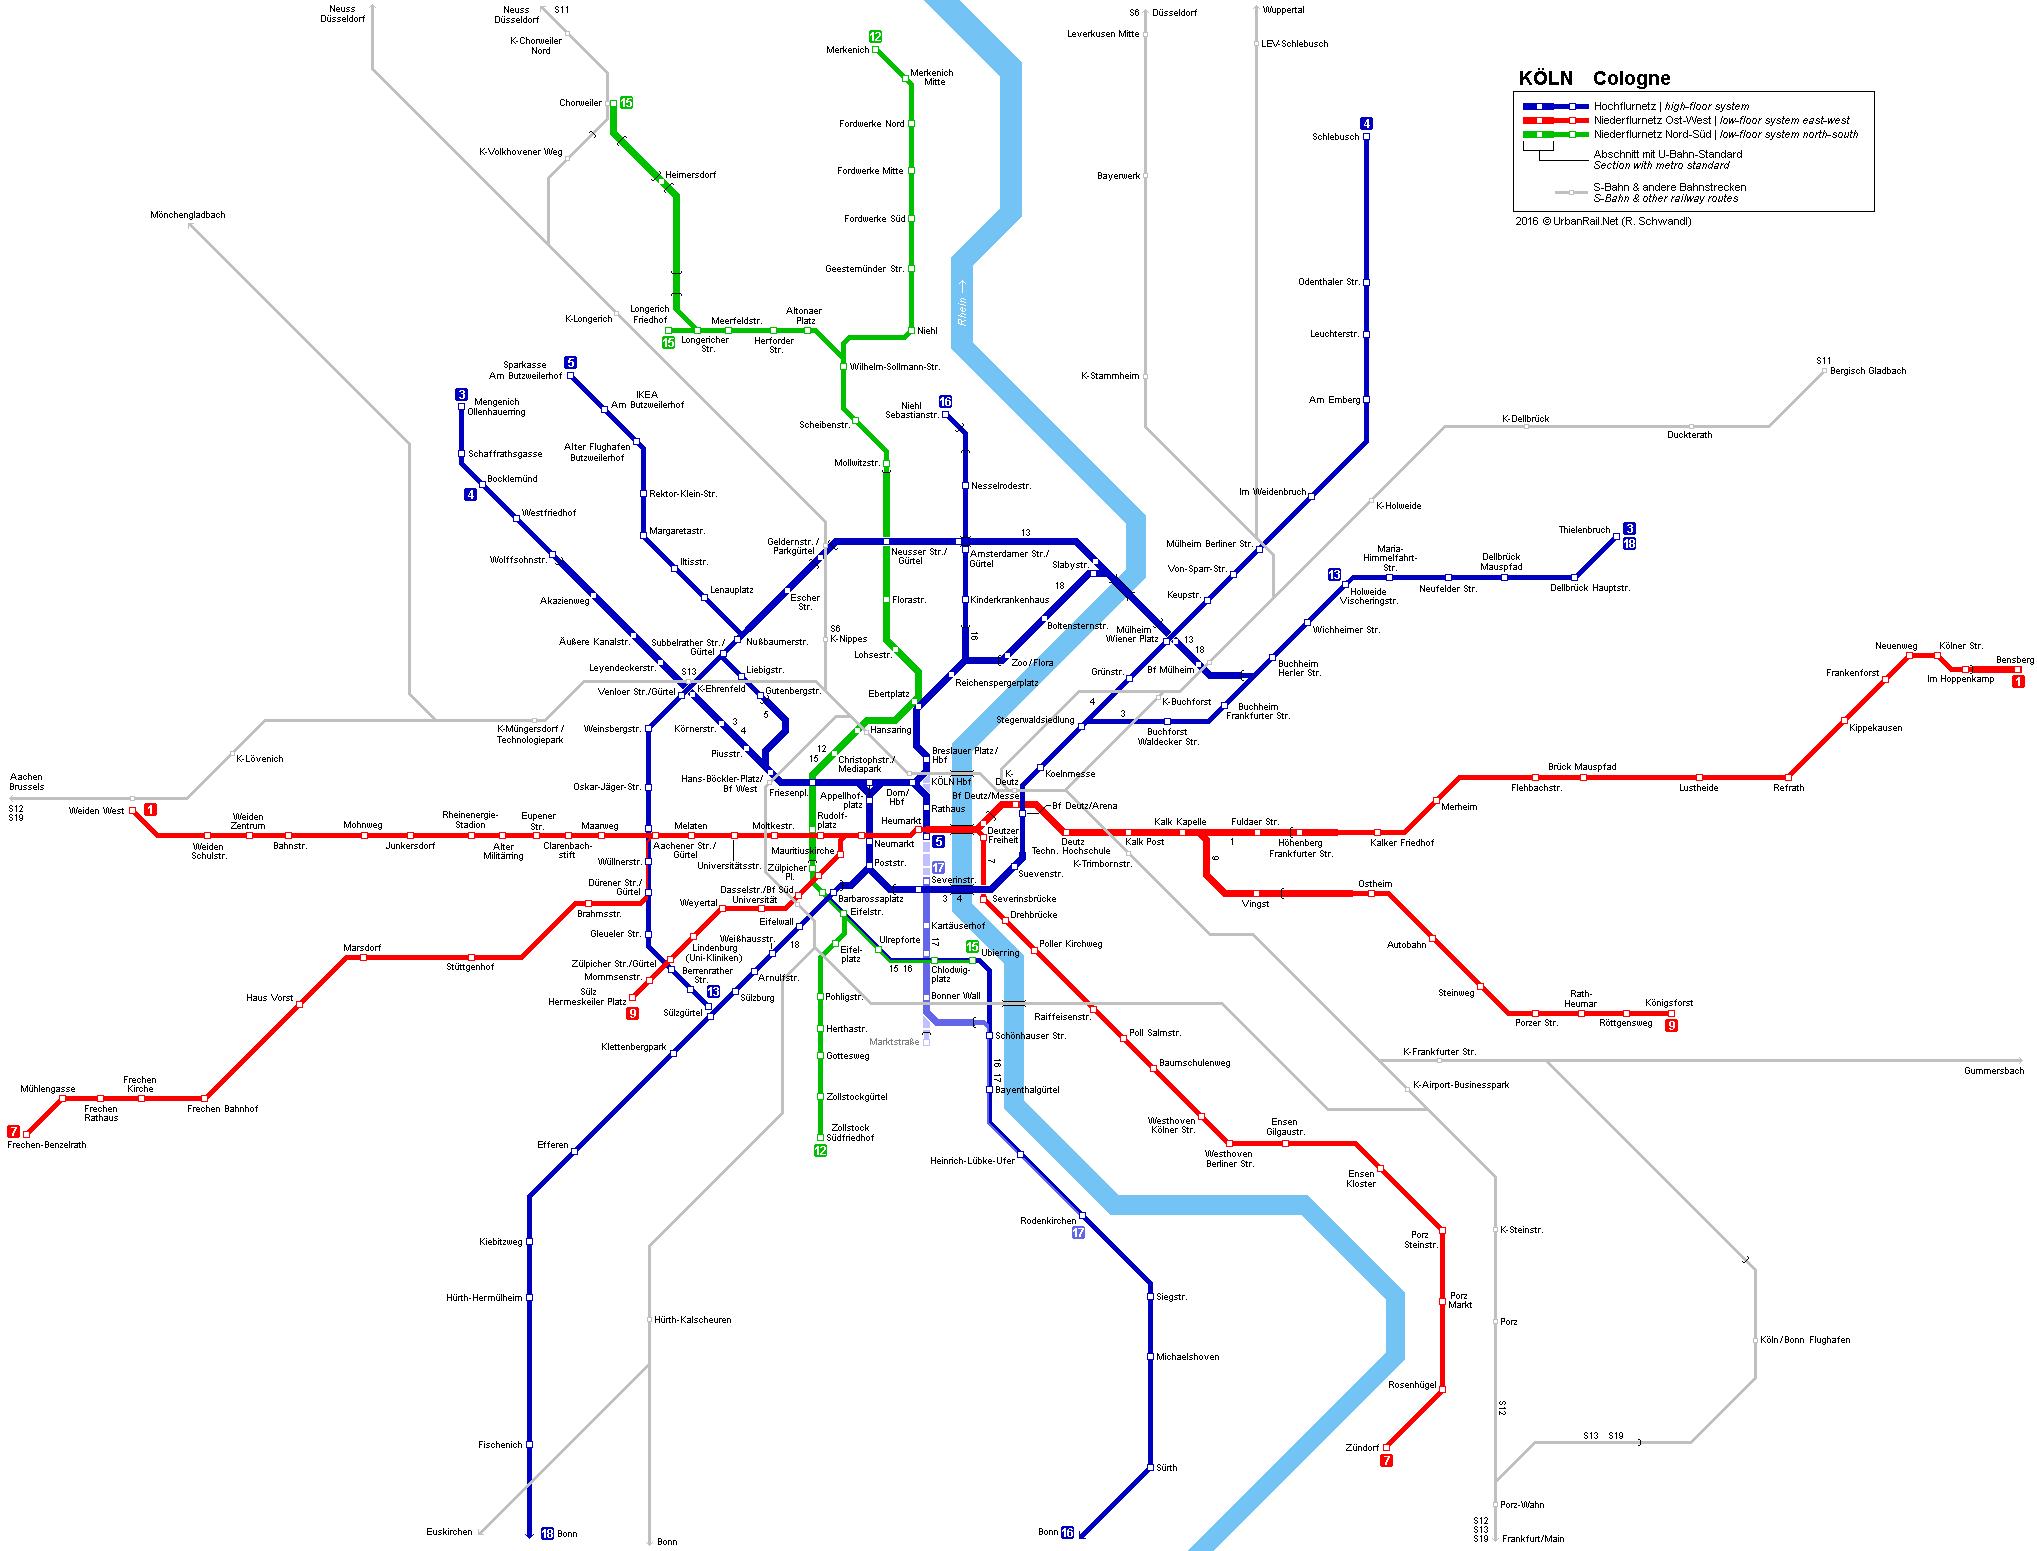 Kln Stadtbahn Netzplan Light Rail Map R Schwandl metro maps